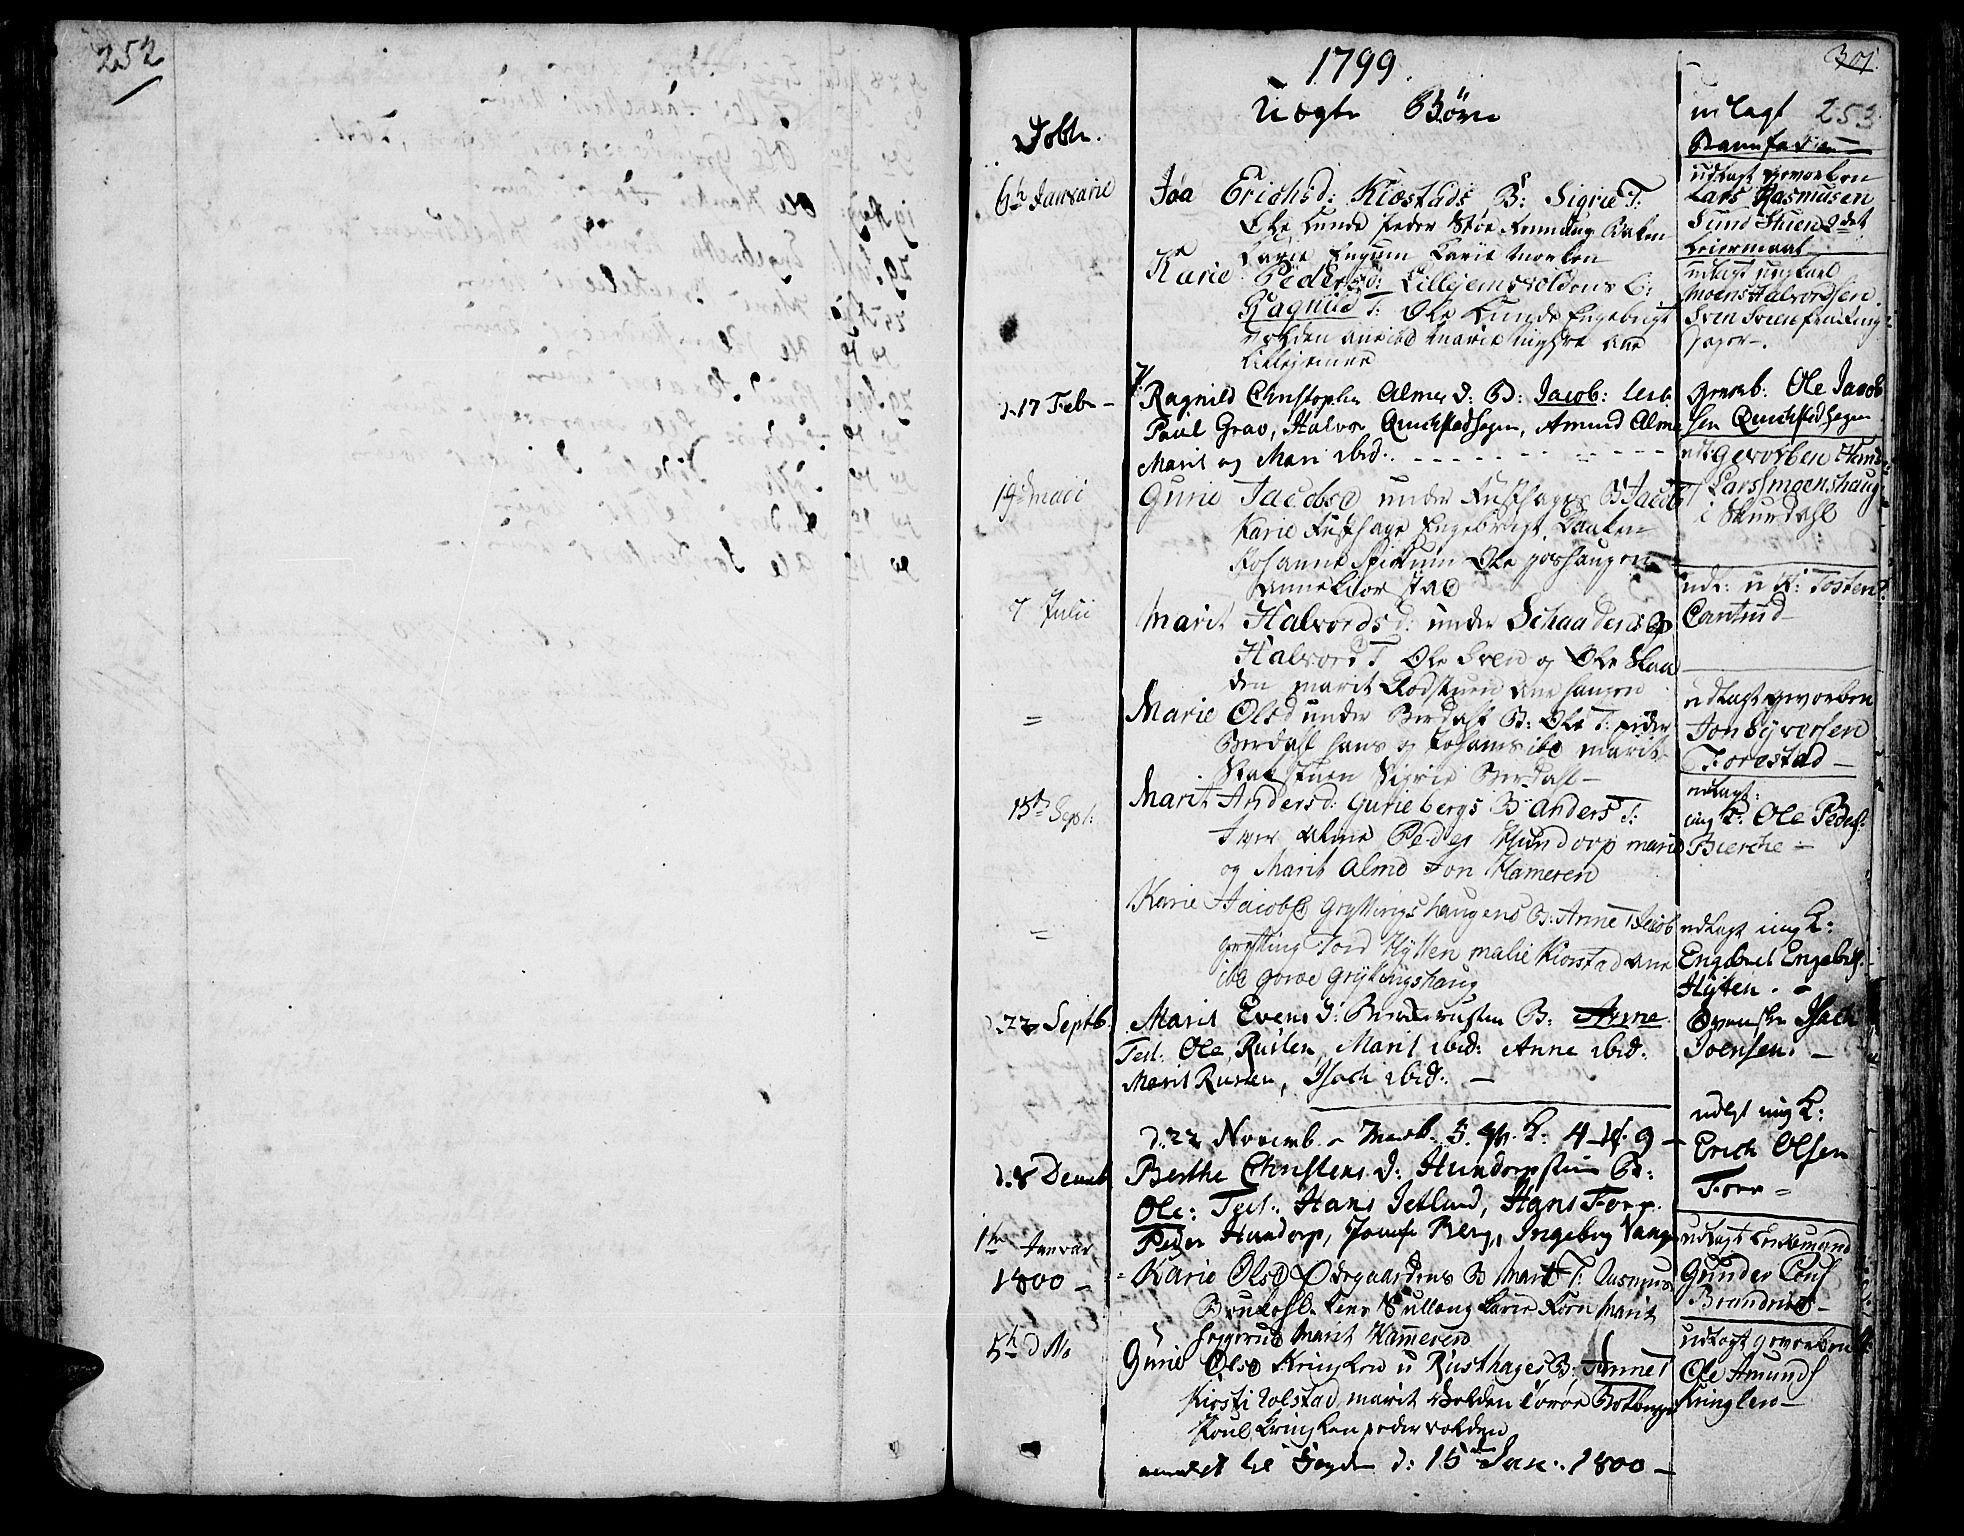 SAH, Fron prestekontor, H/Ha/Haa/L0001: Ministerialbok nr. 1, 1799-1816, s. 252-253